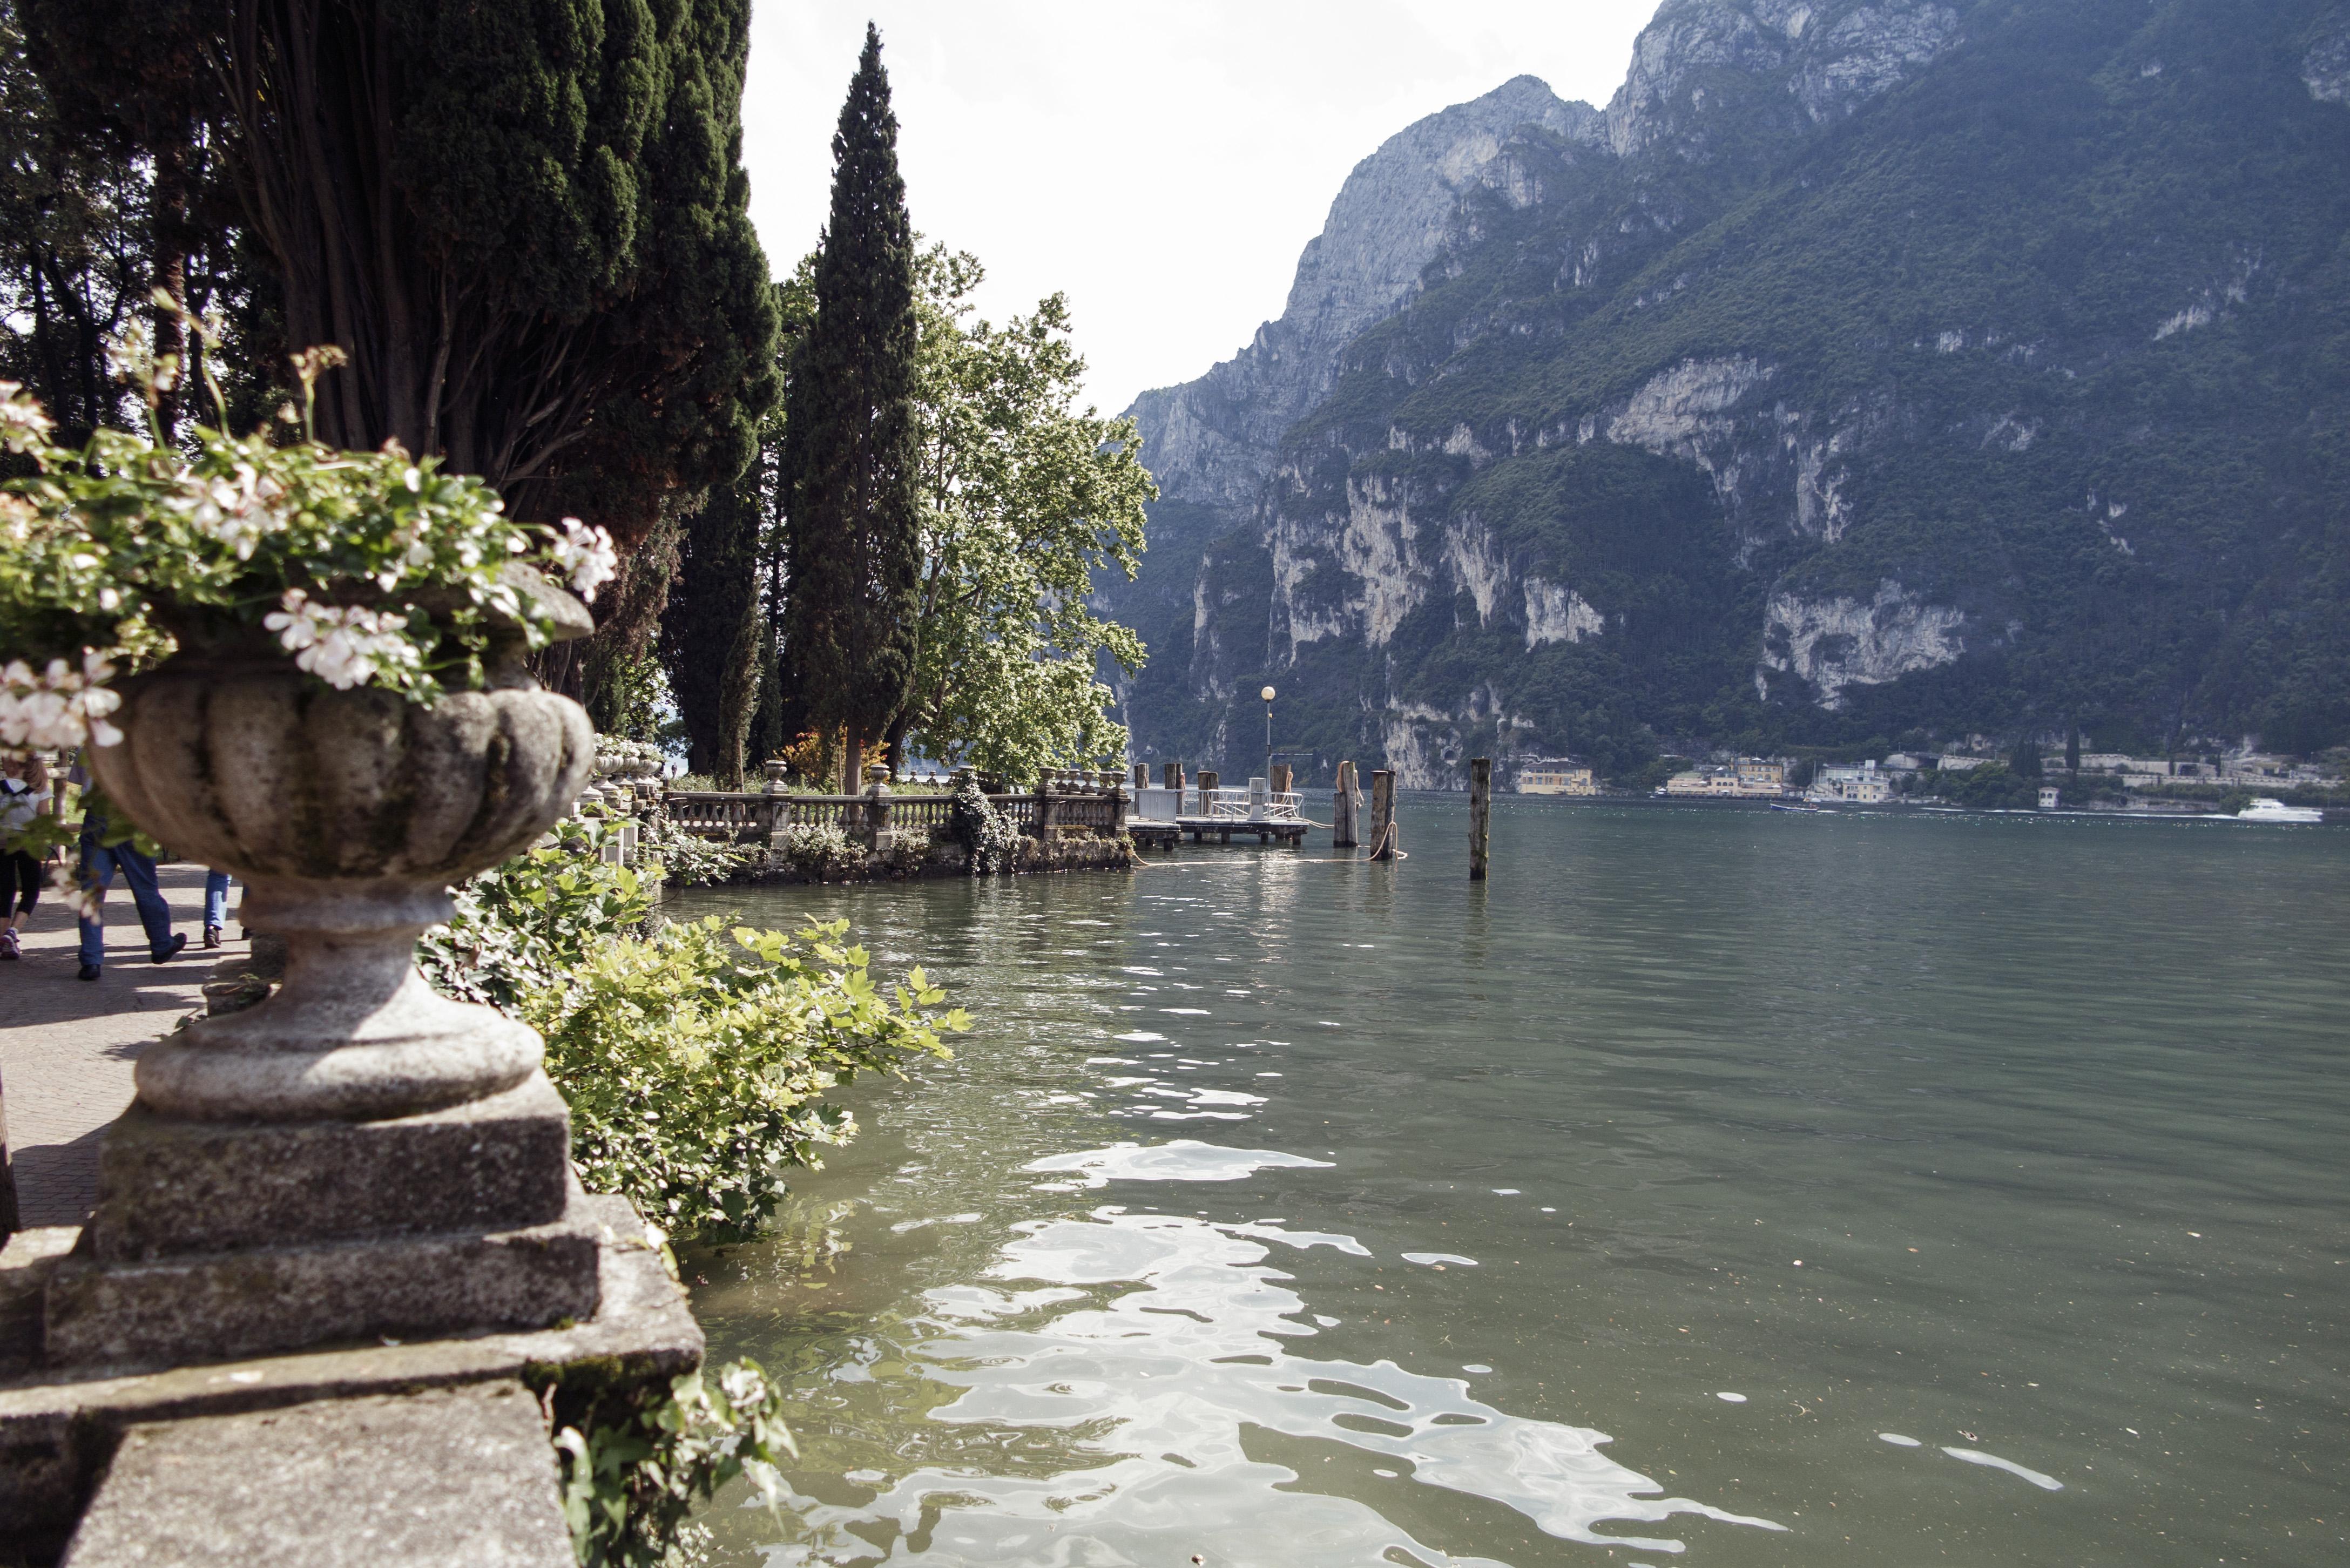 limone sul garda, lago de garda, lombardia, italia, malcesine, riva del garda, expo riva schuh 86, travel, viajes, turismo,